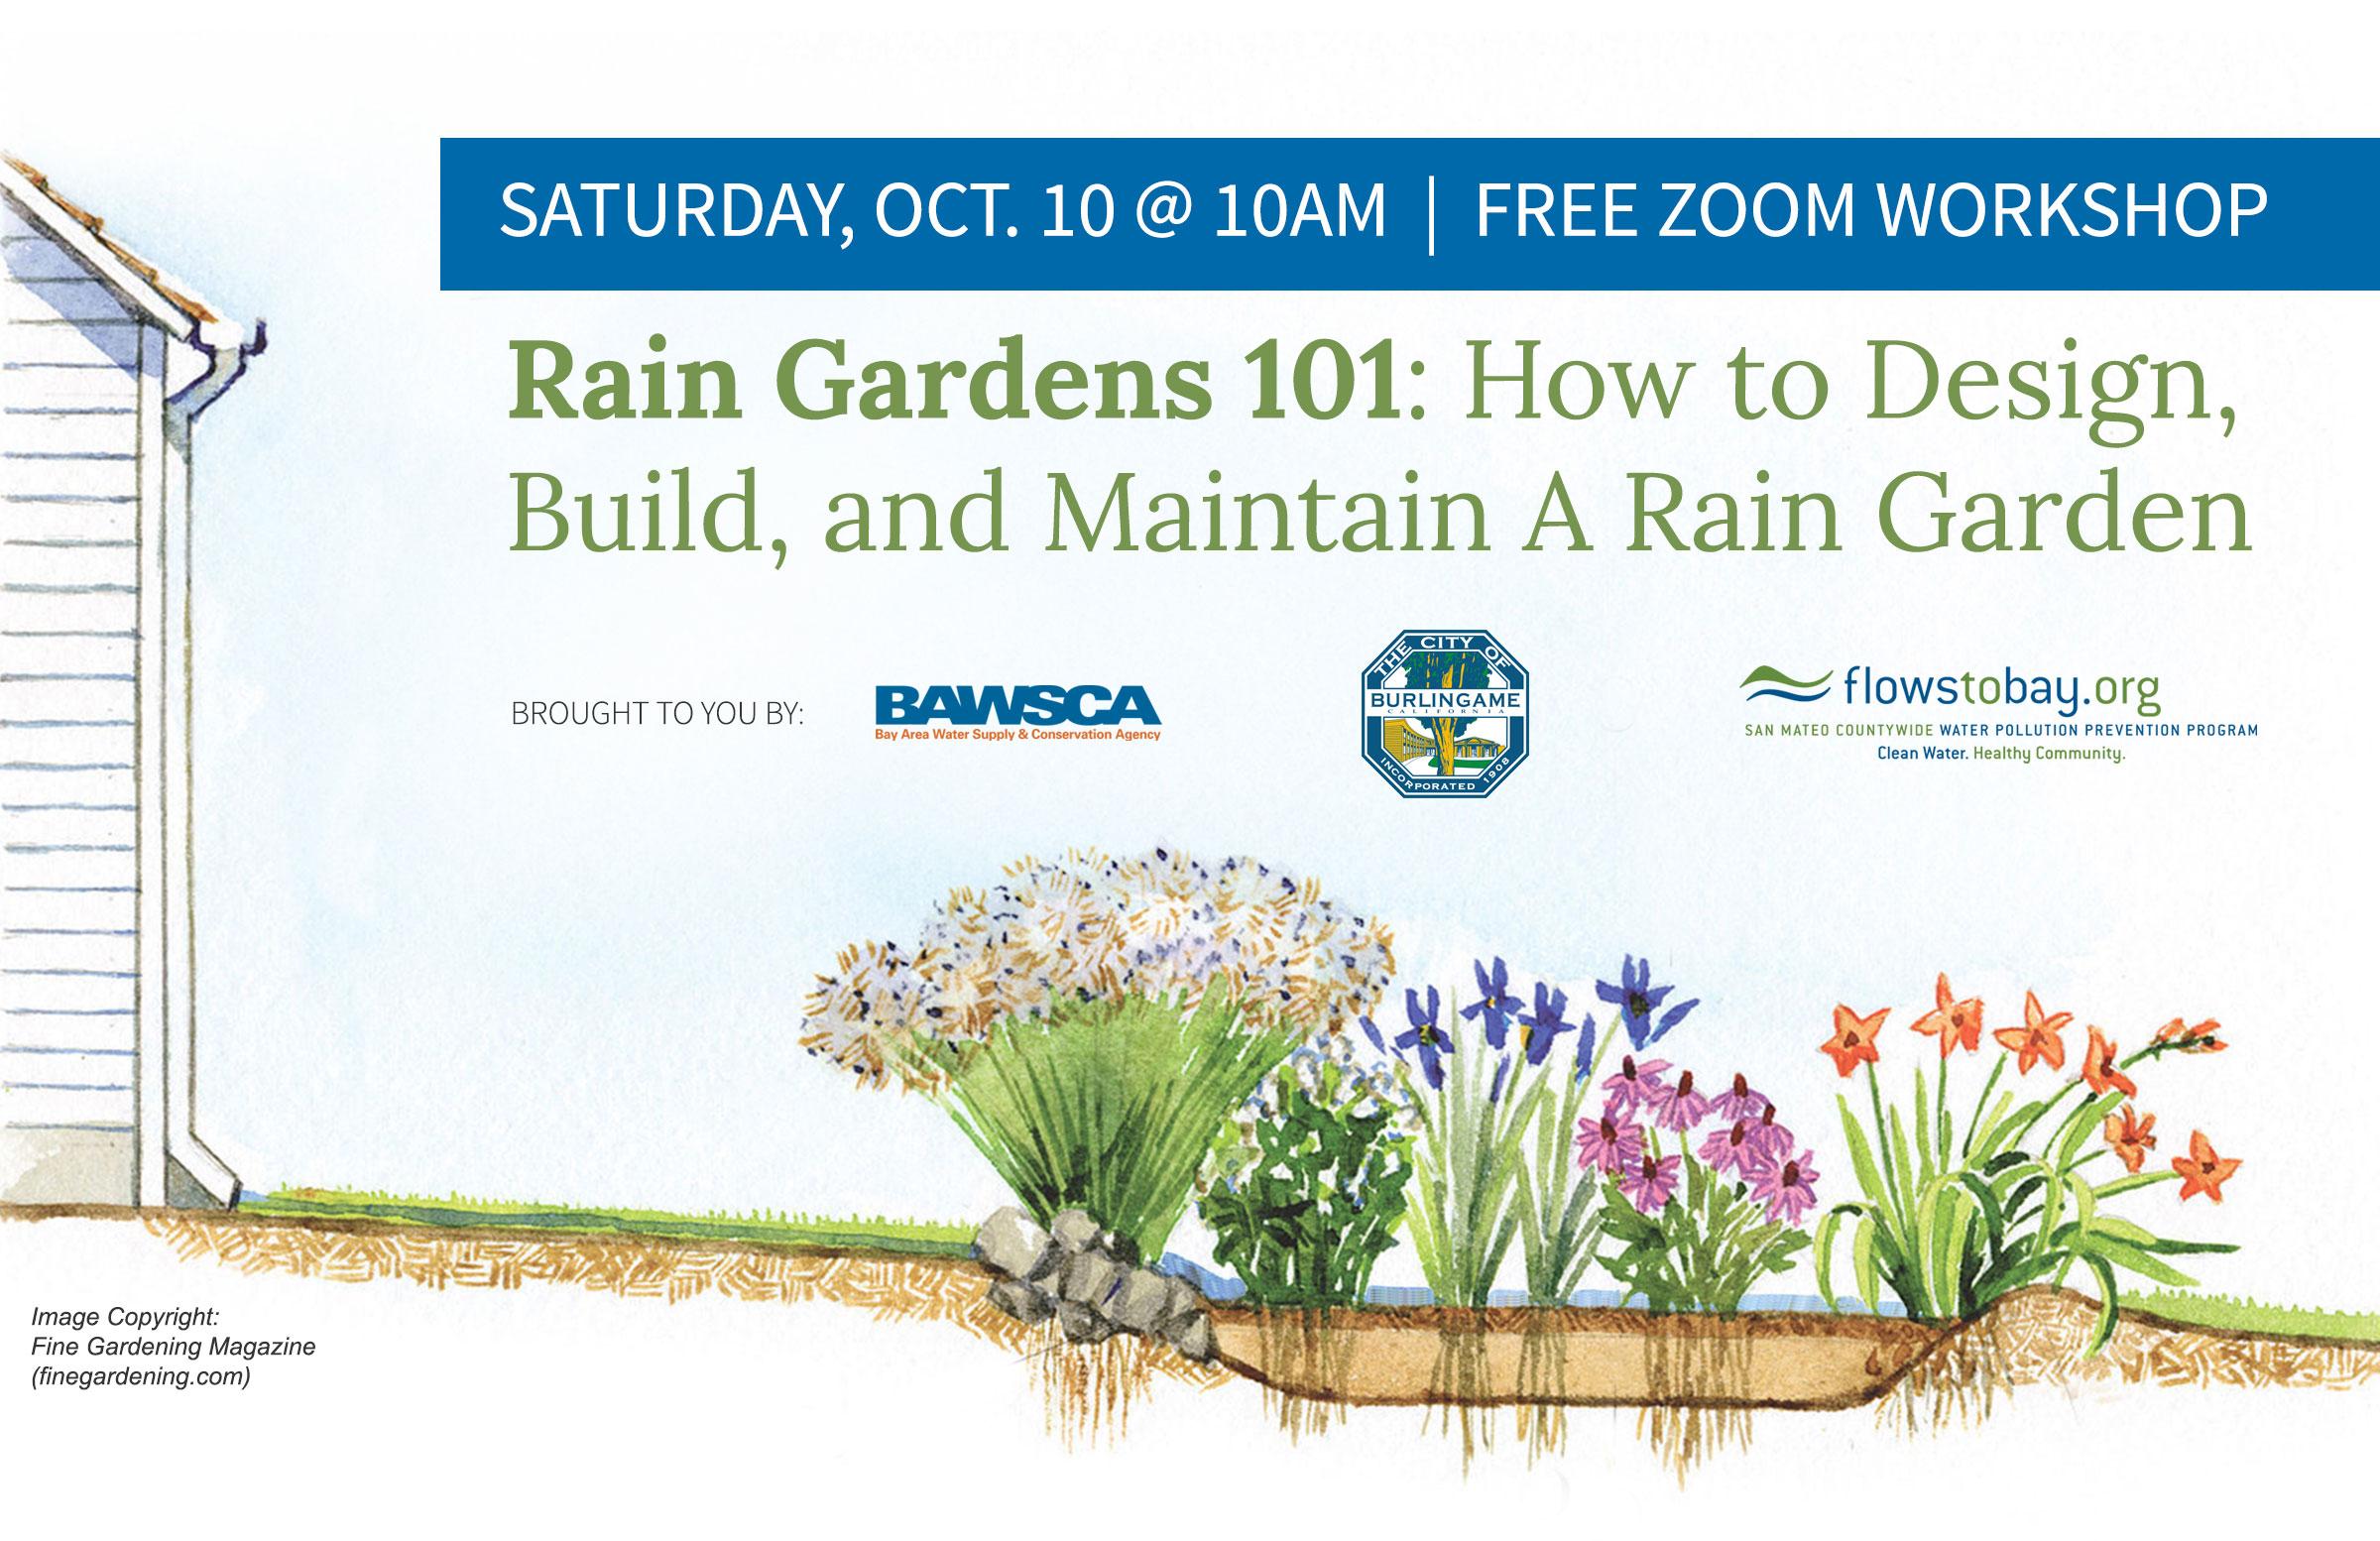 Rain garden rebate image with logos